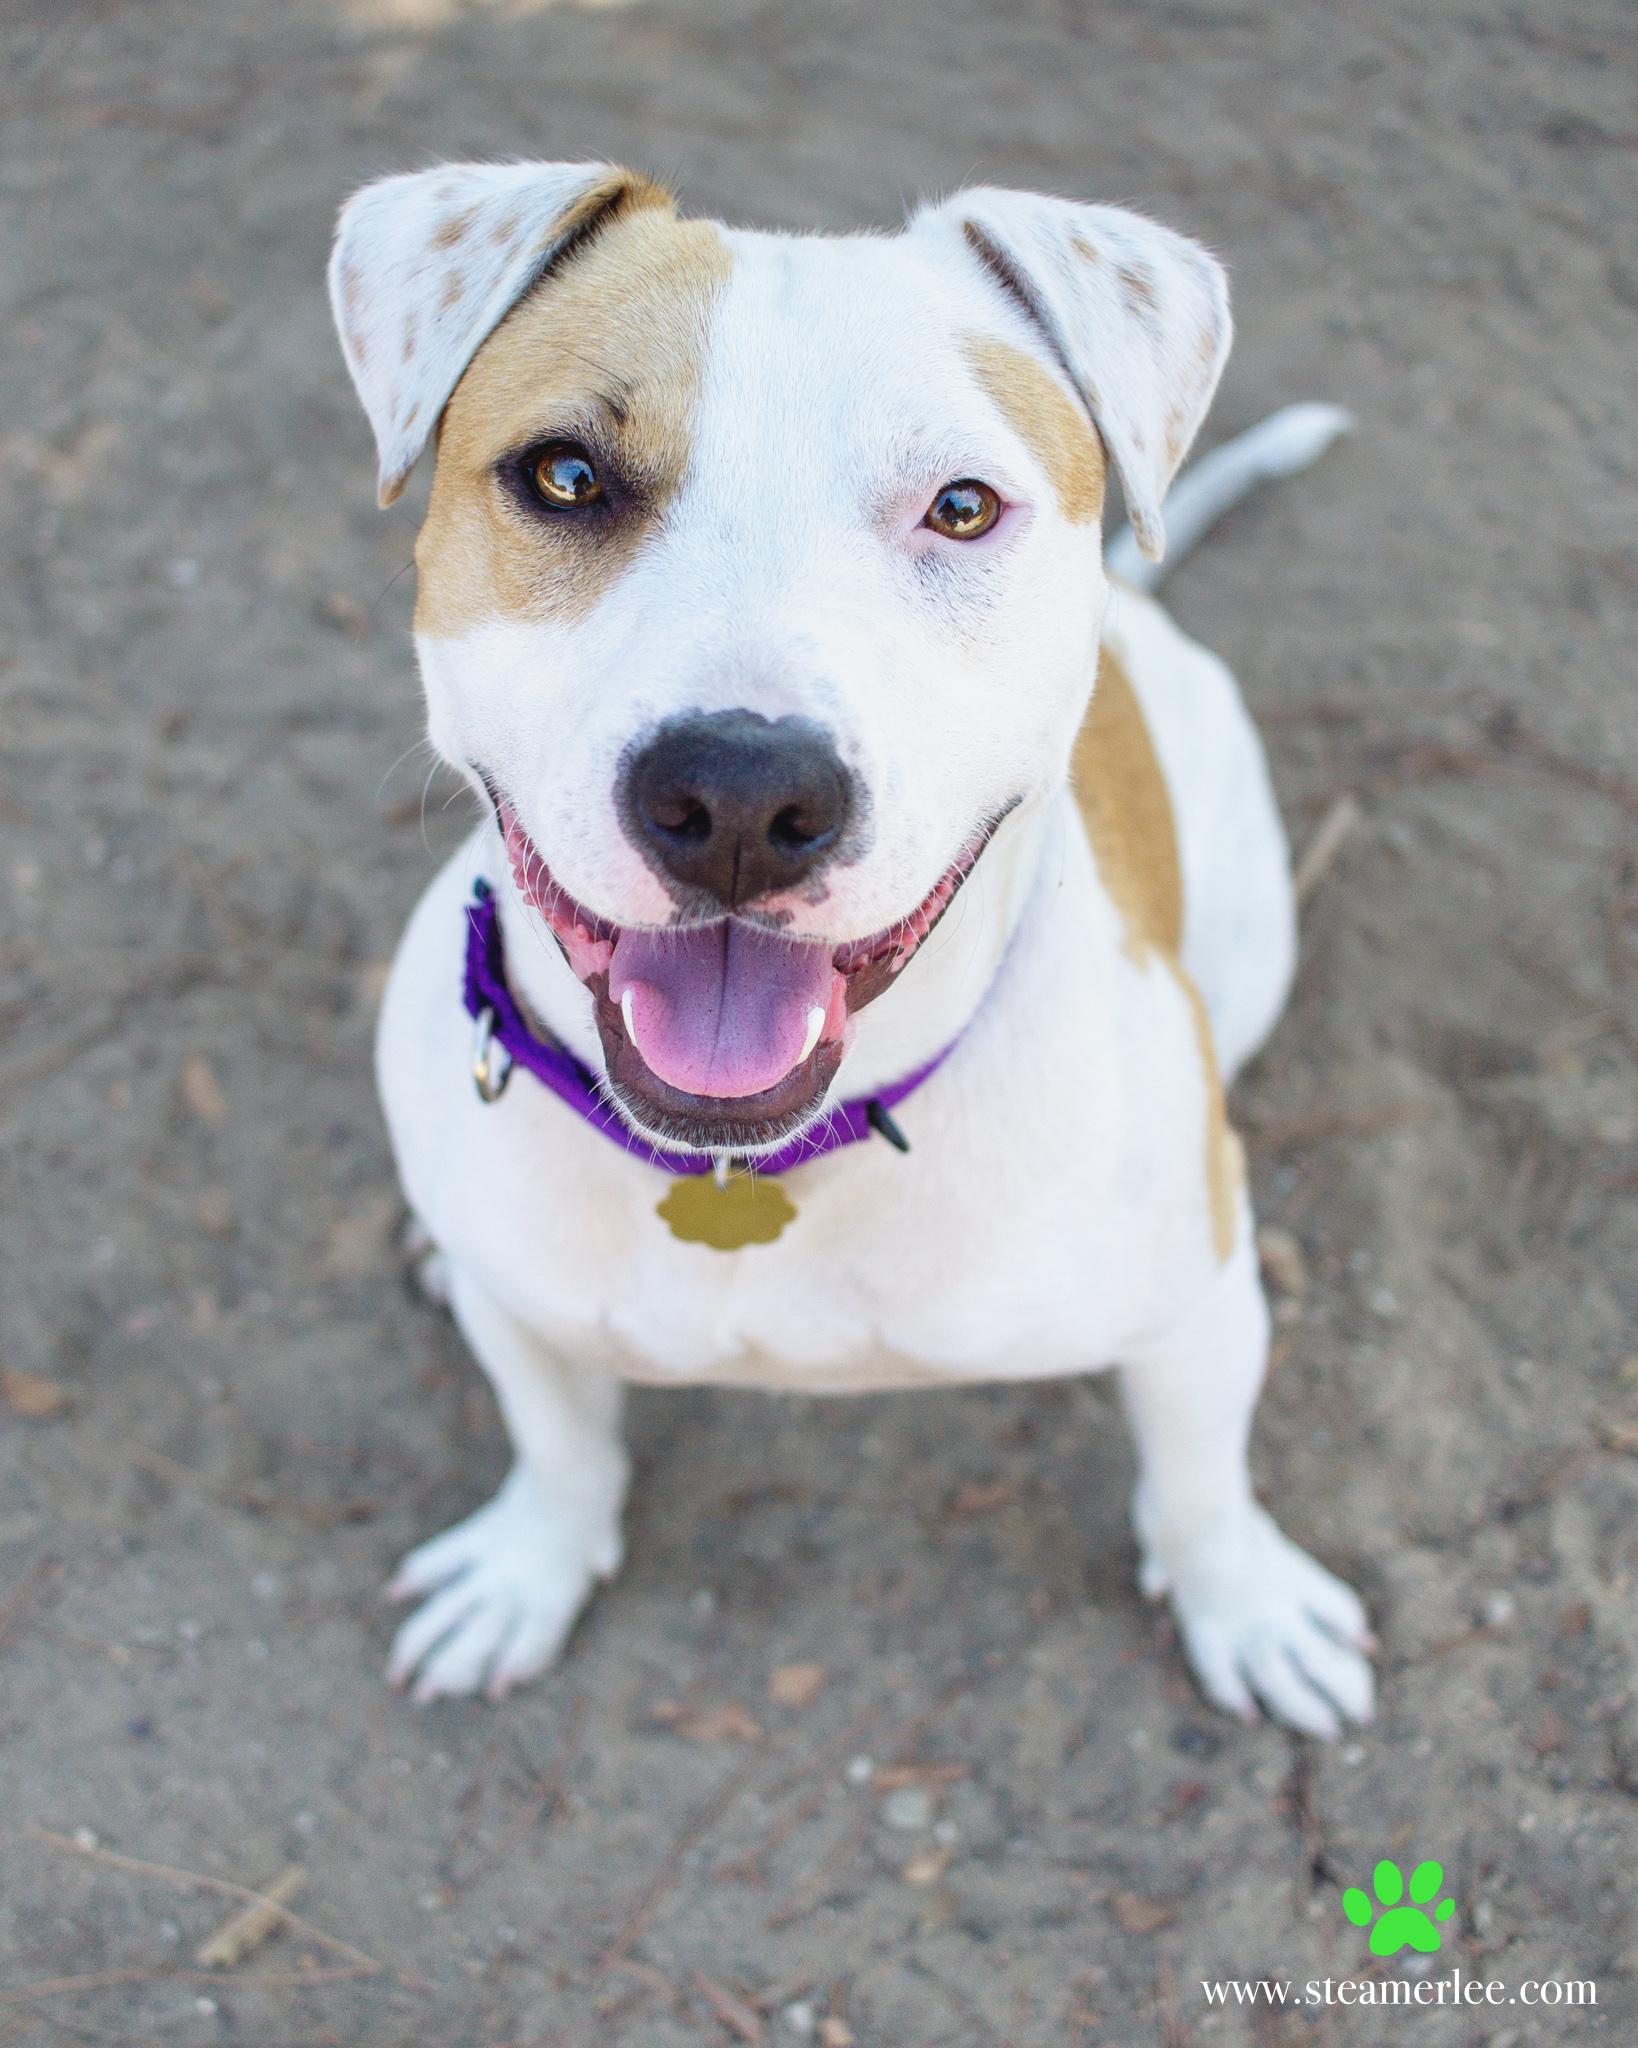 489-Orange-County-Dog-Photography-Steamer-Lee-Southern-California-SBACC.JPG